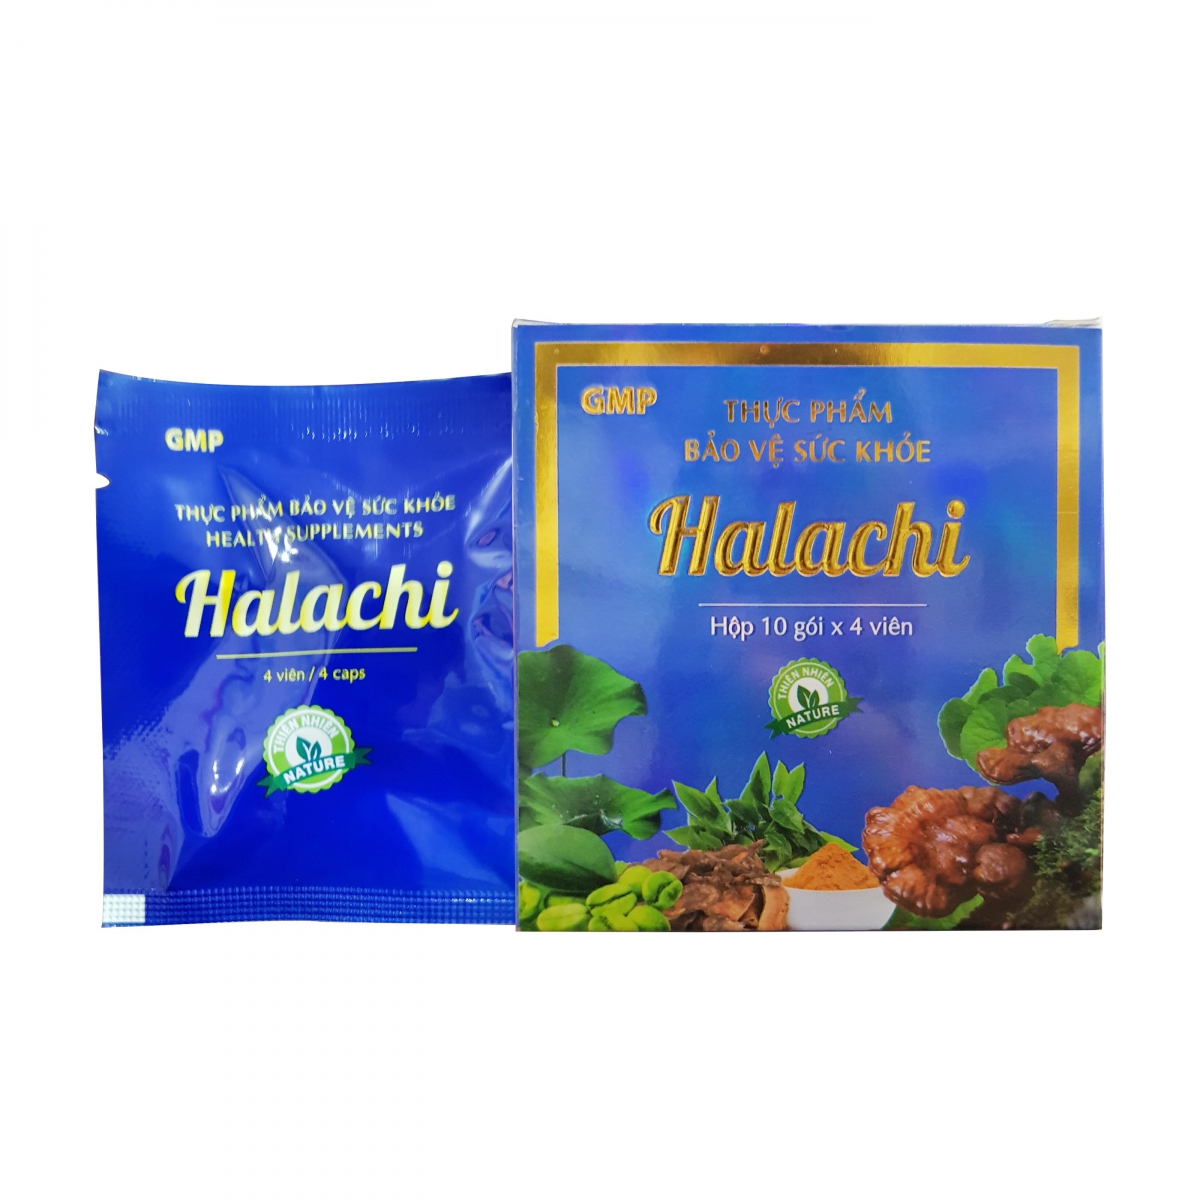 Giảm cân Halachi được bán tại Slimbody.vn